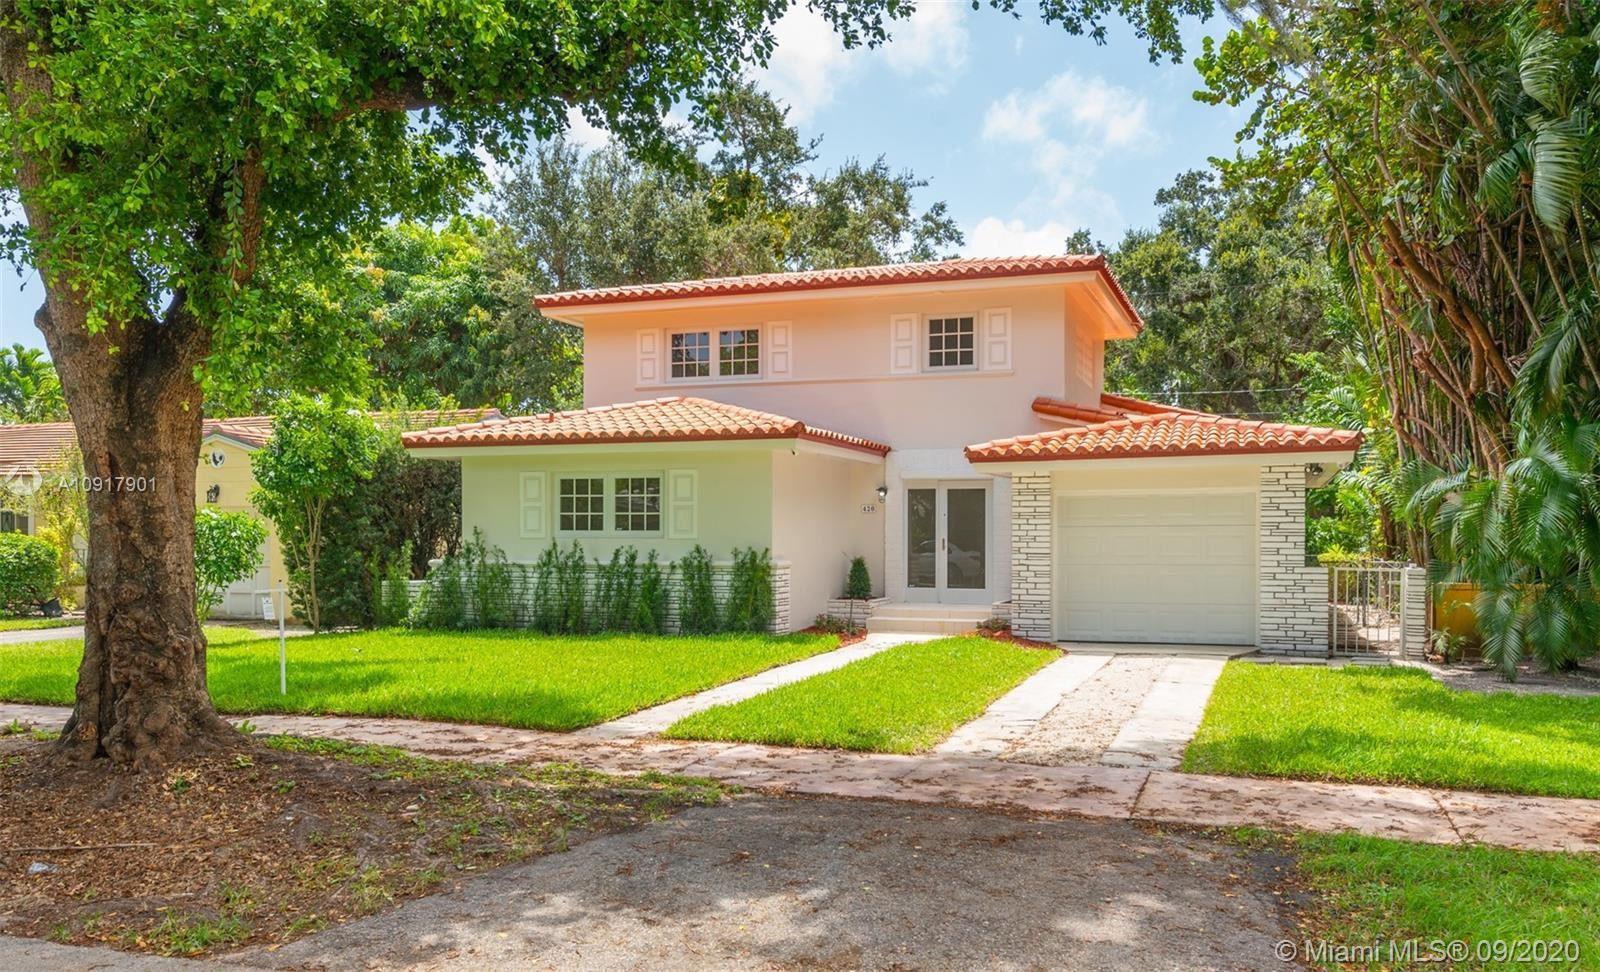 420 Aledo Ave, Coral Gables, FL 33134 - #: A10917901